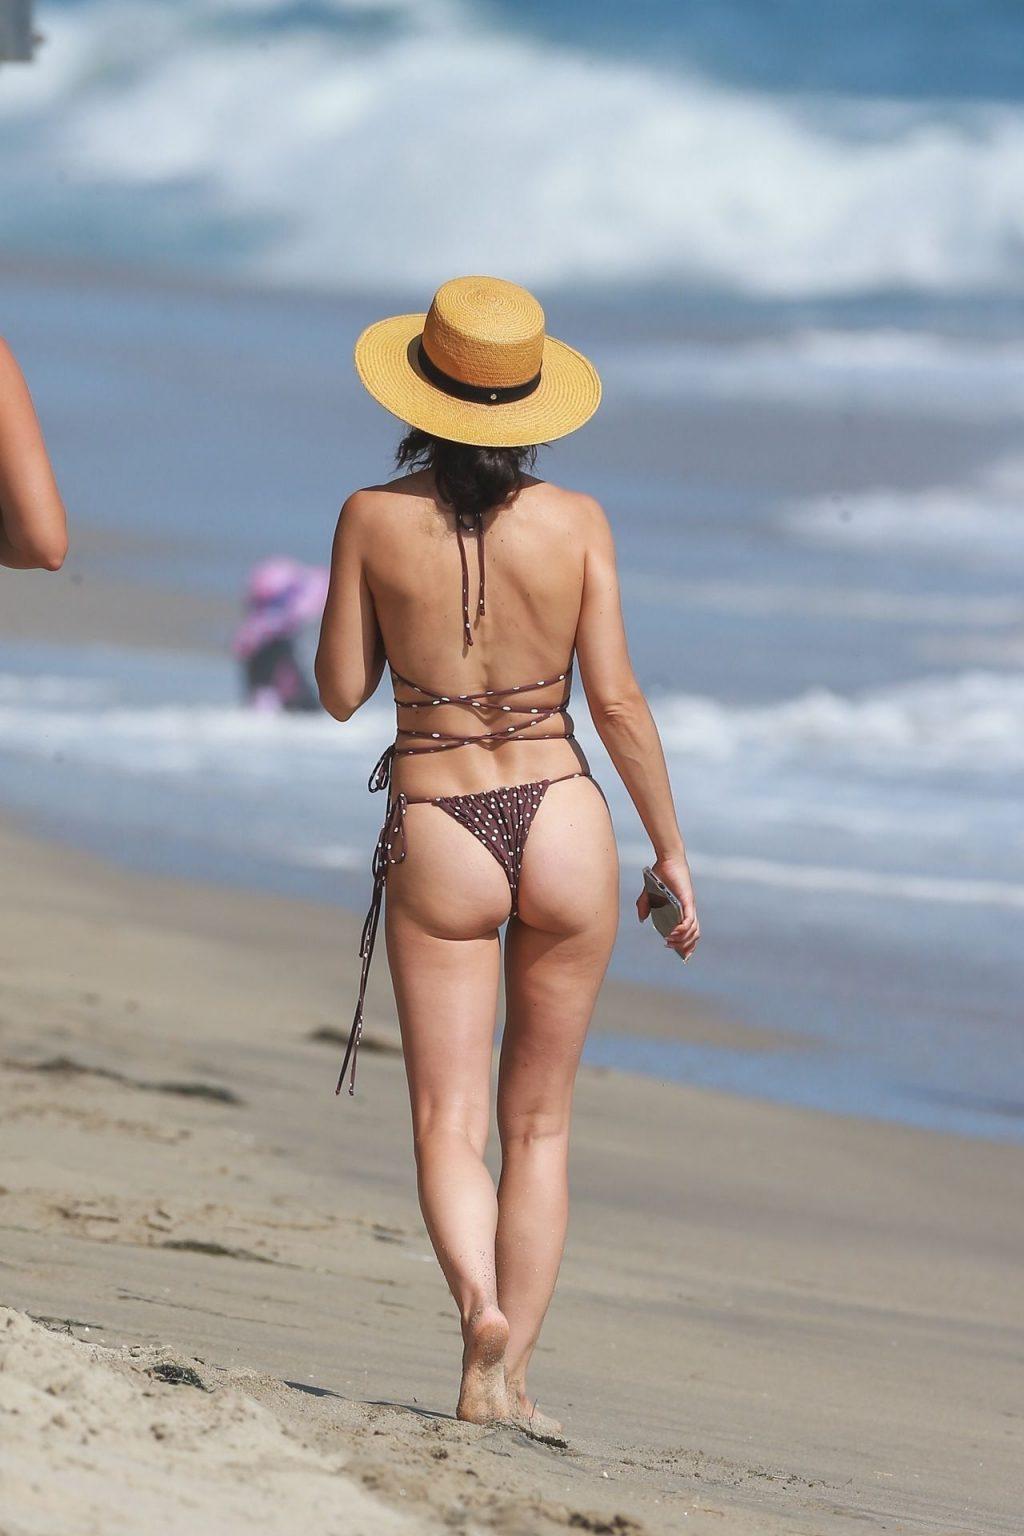 Cara Santana Shows Her Tits and Ass on the Beach (45 Photos)